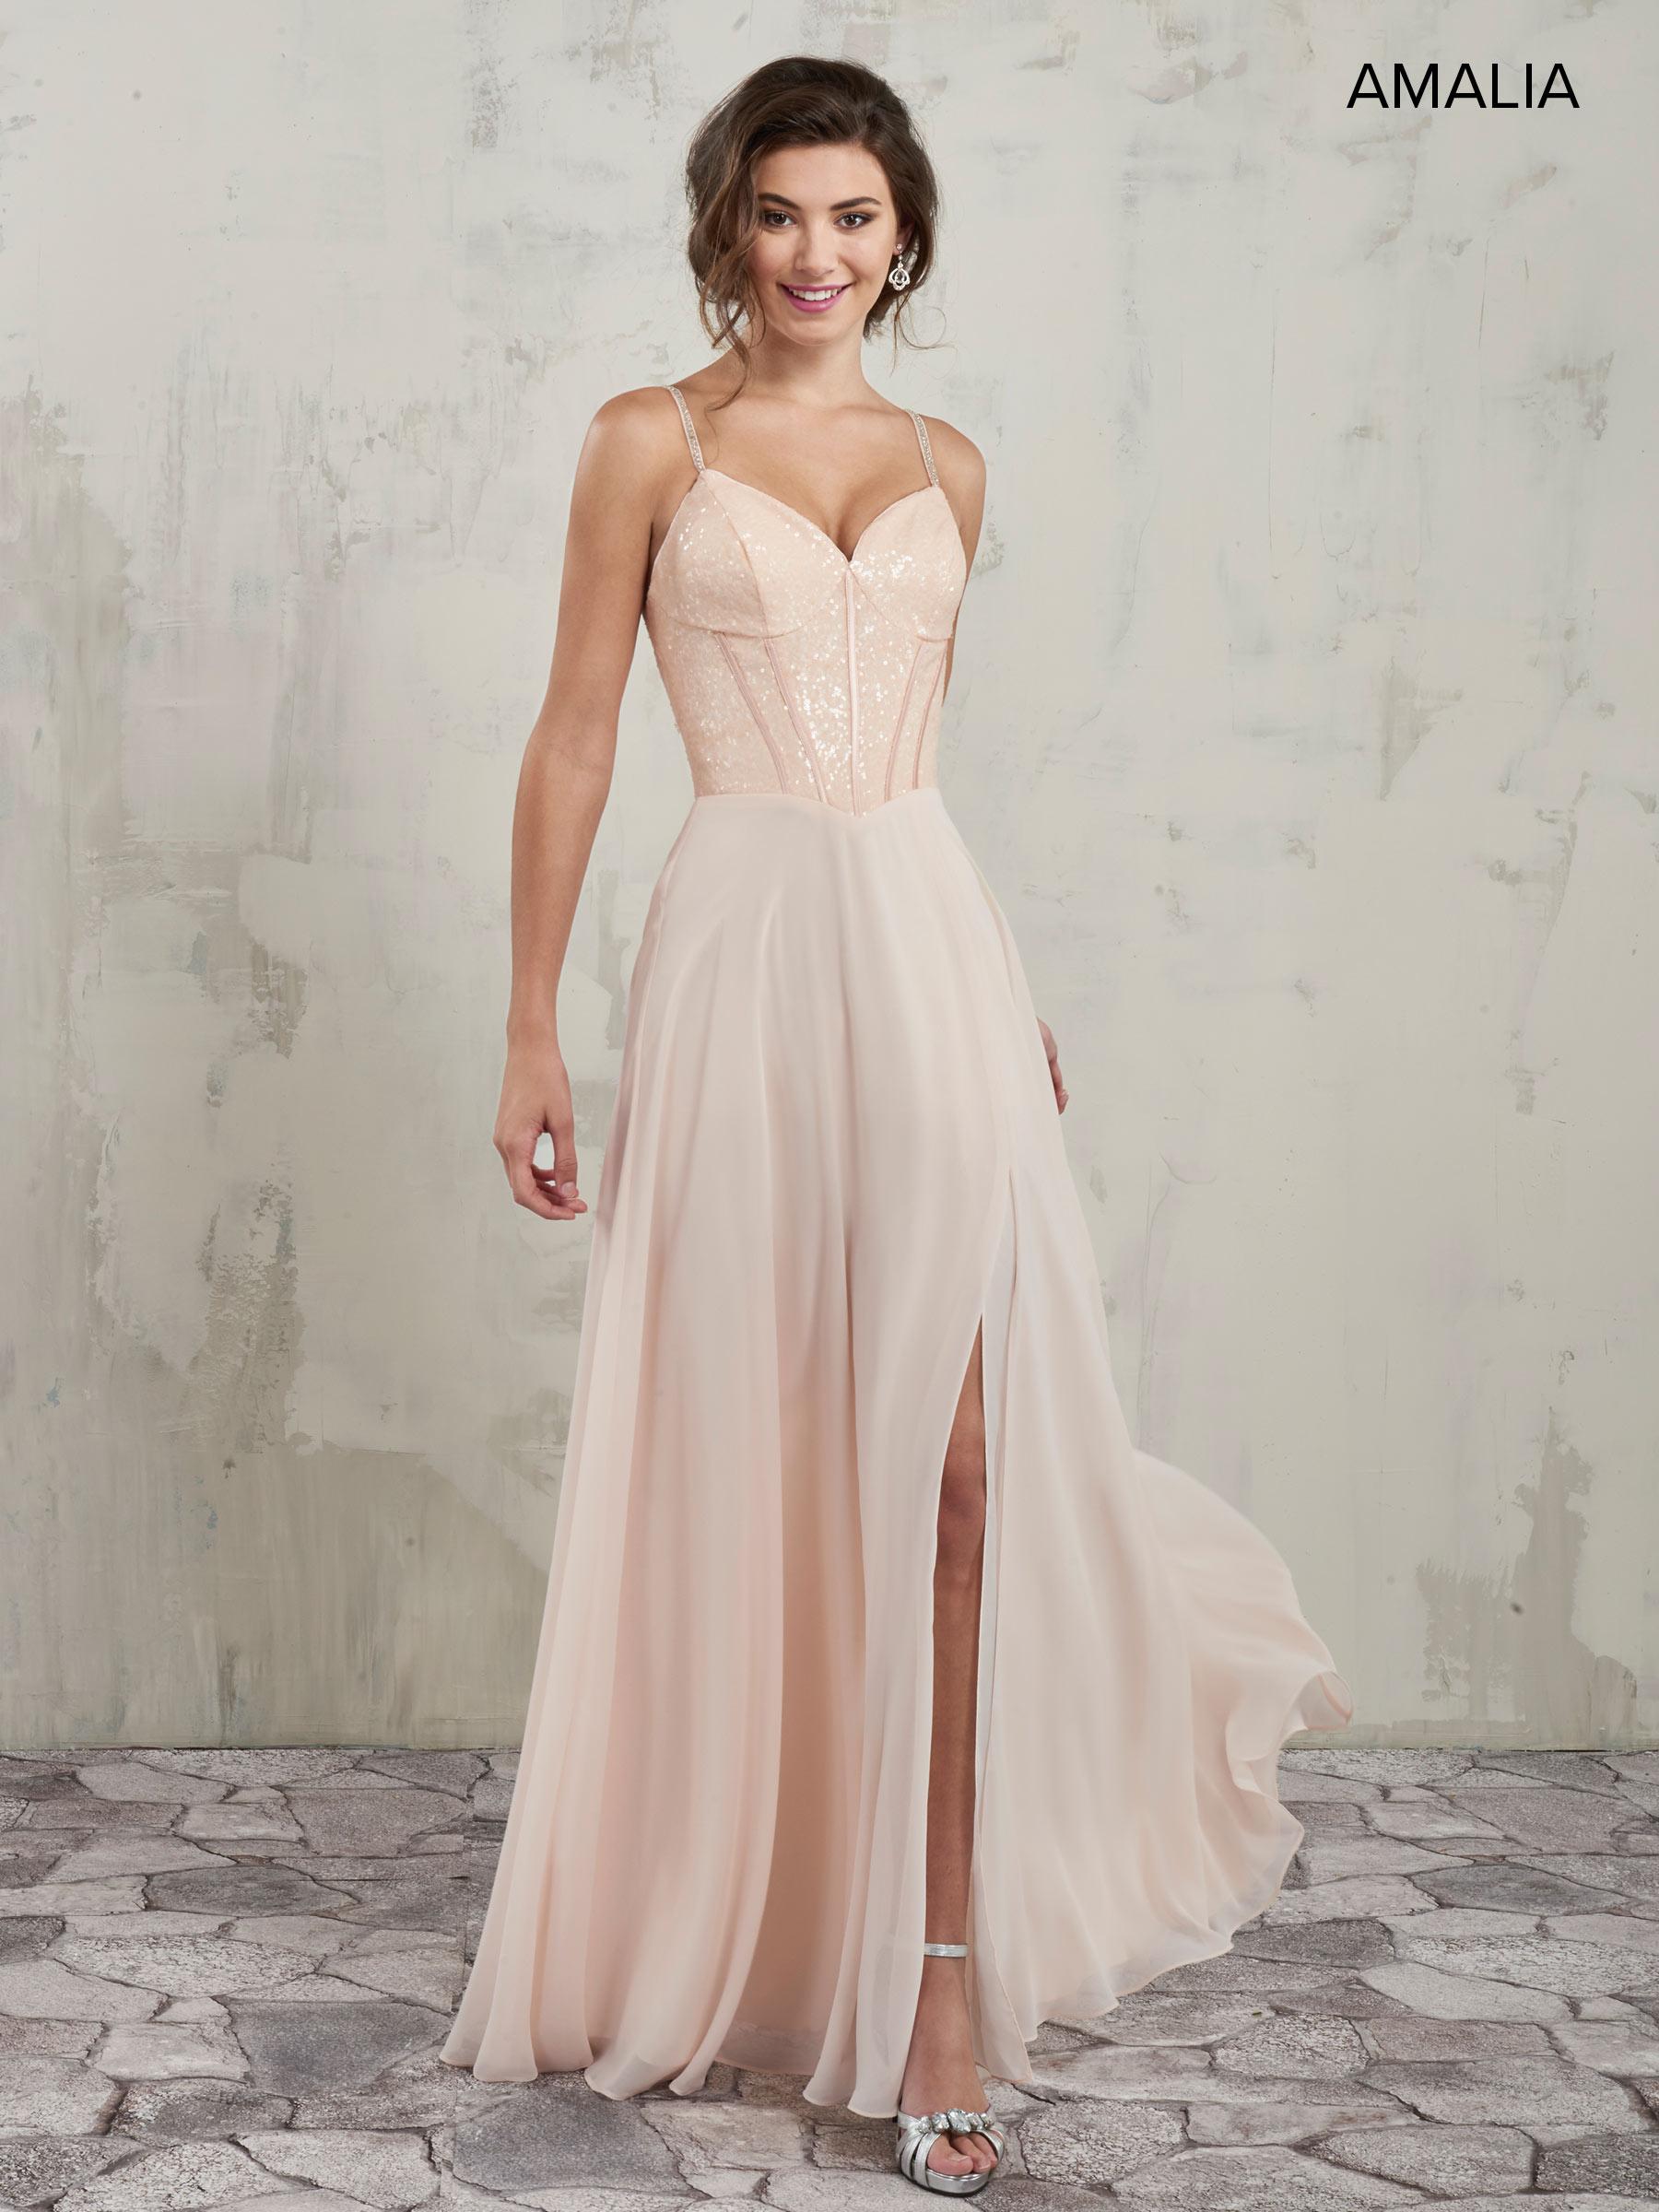 Amalia Bridesmaid Dresses | Amalia | Style - MB7017